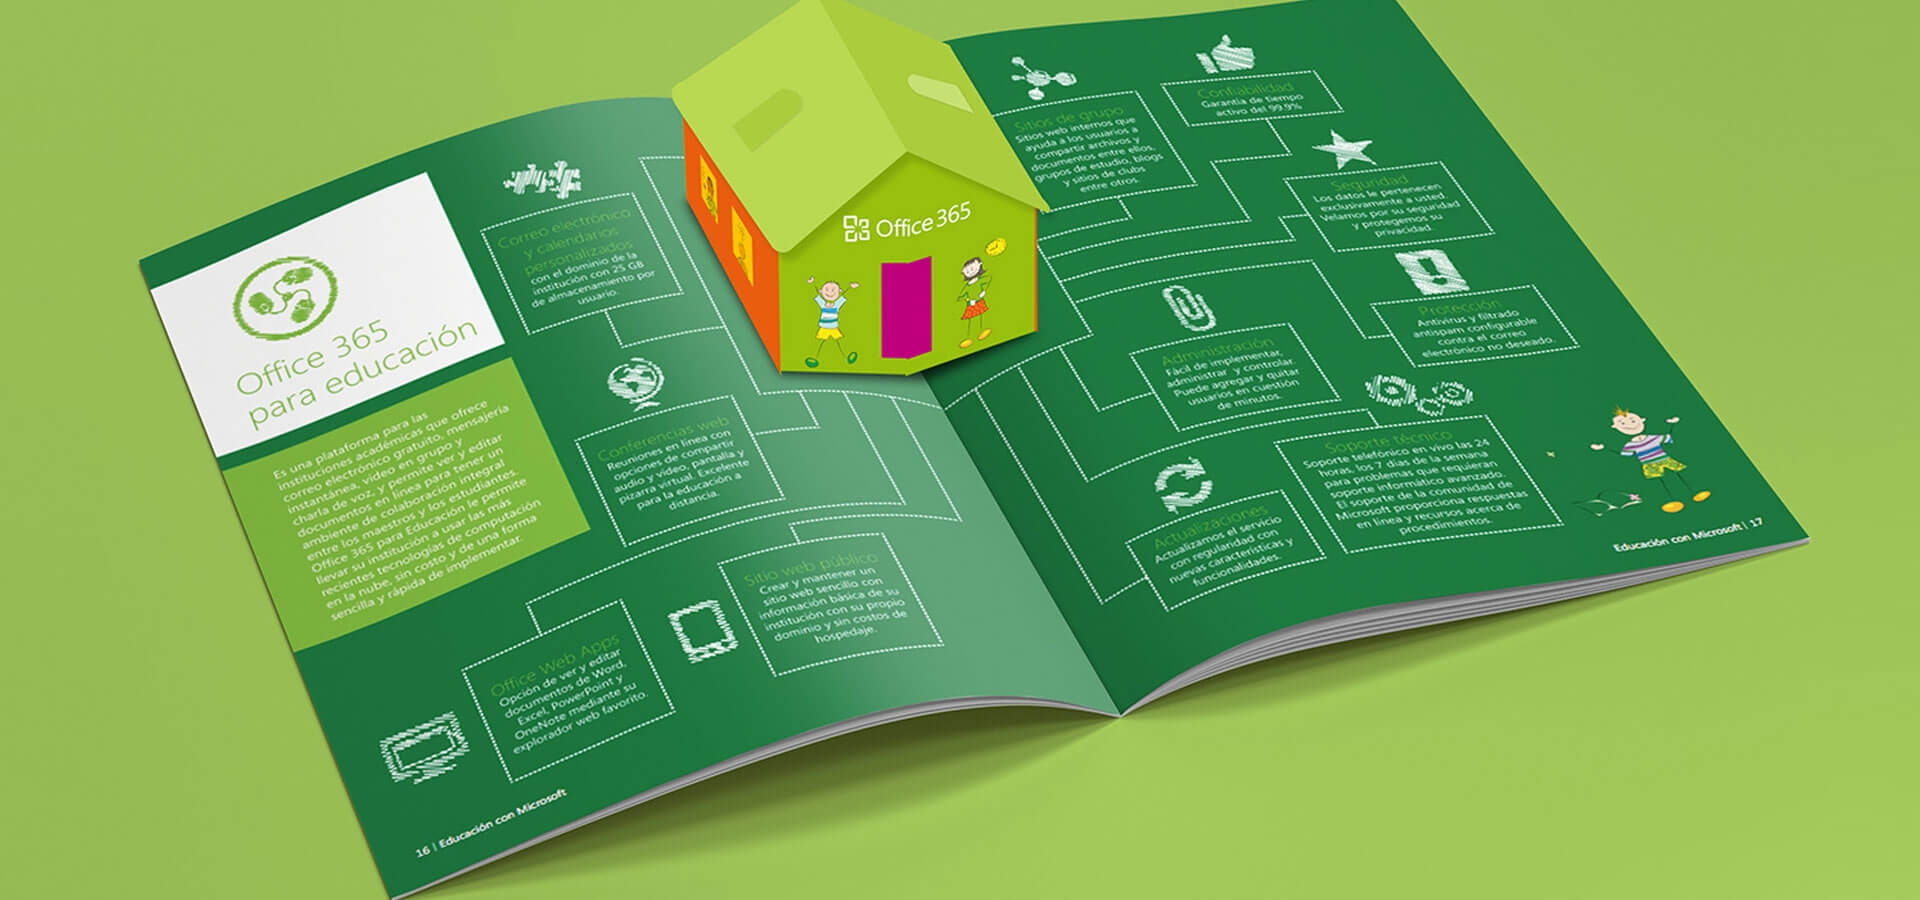 19+ 3D Pop Up Brochure Designs   Free & Premium Templates In Pop Up Brochure Template